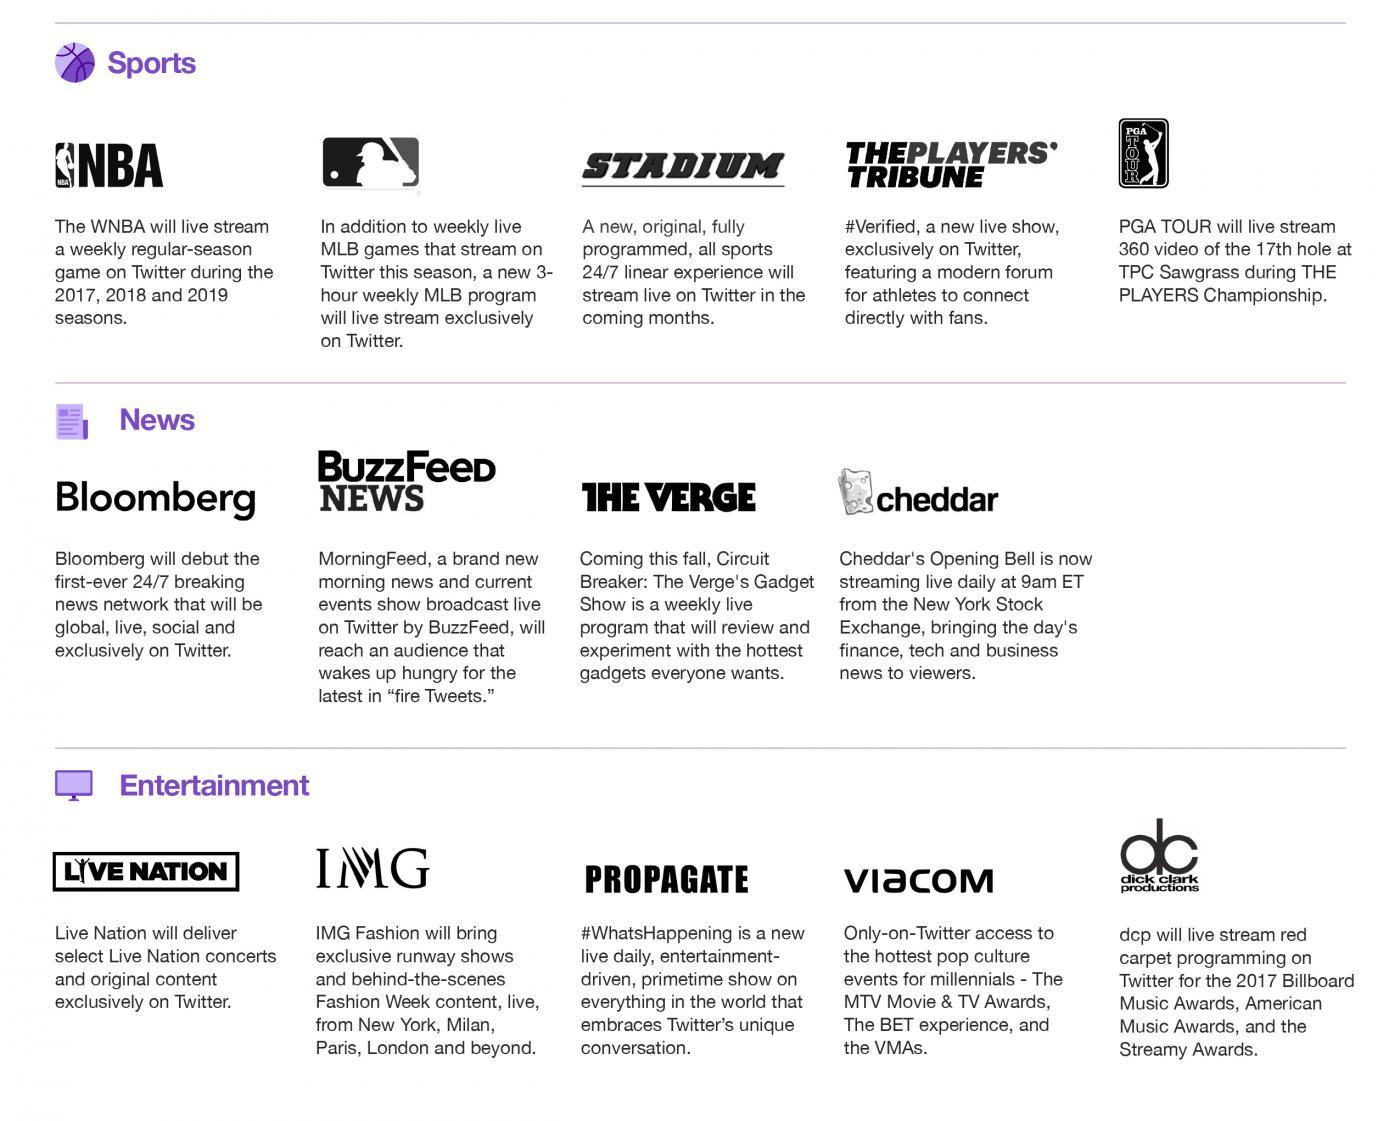 Twitter transmitirá streaming de Bloomberg las 24hs a partir de Otoño 2